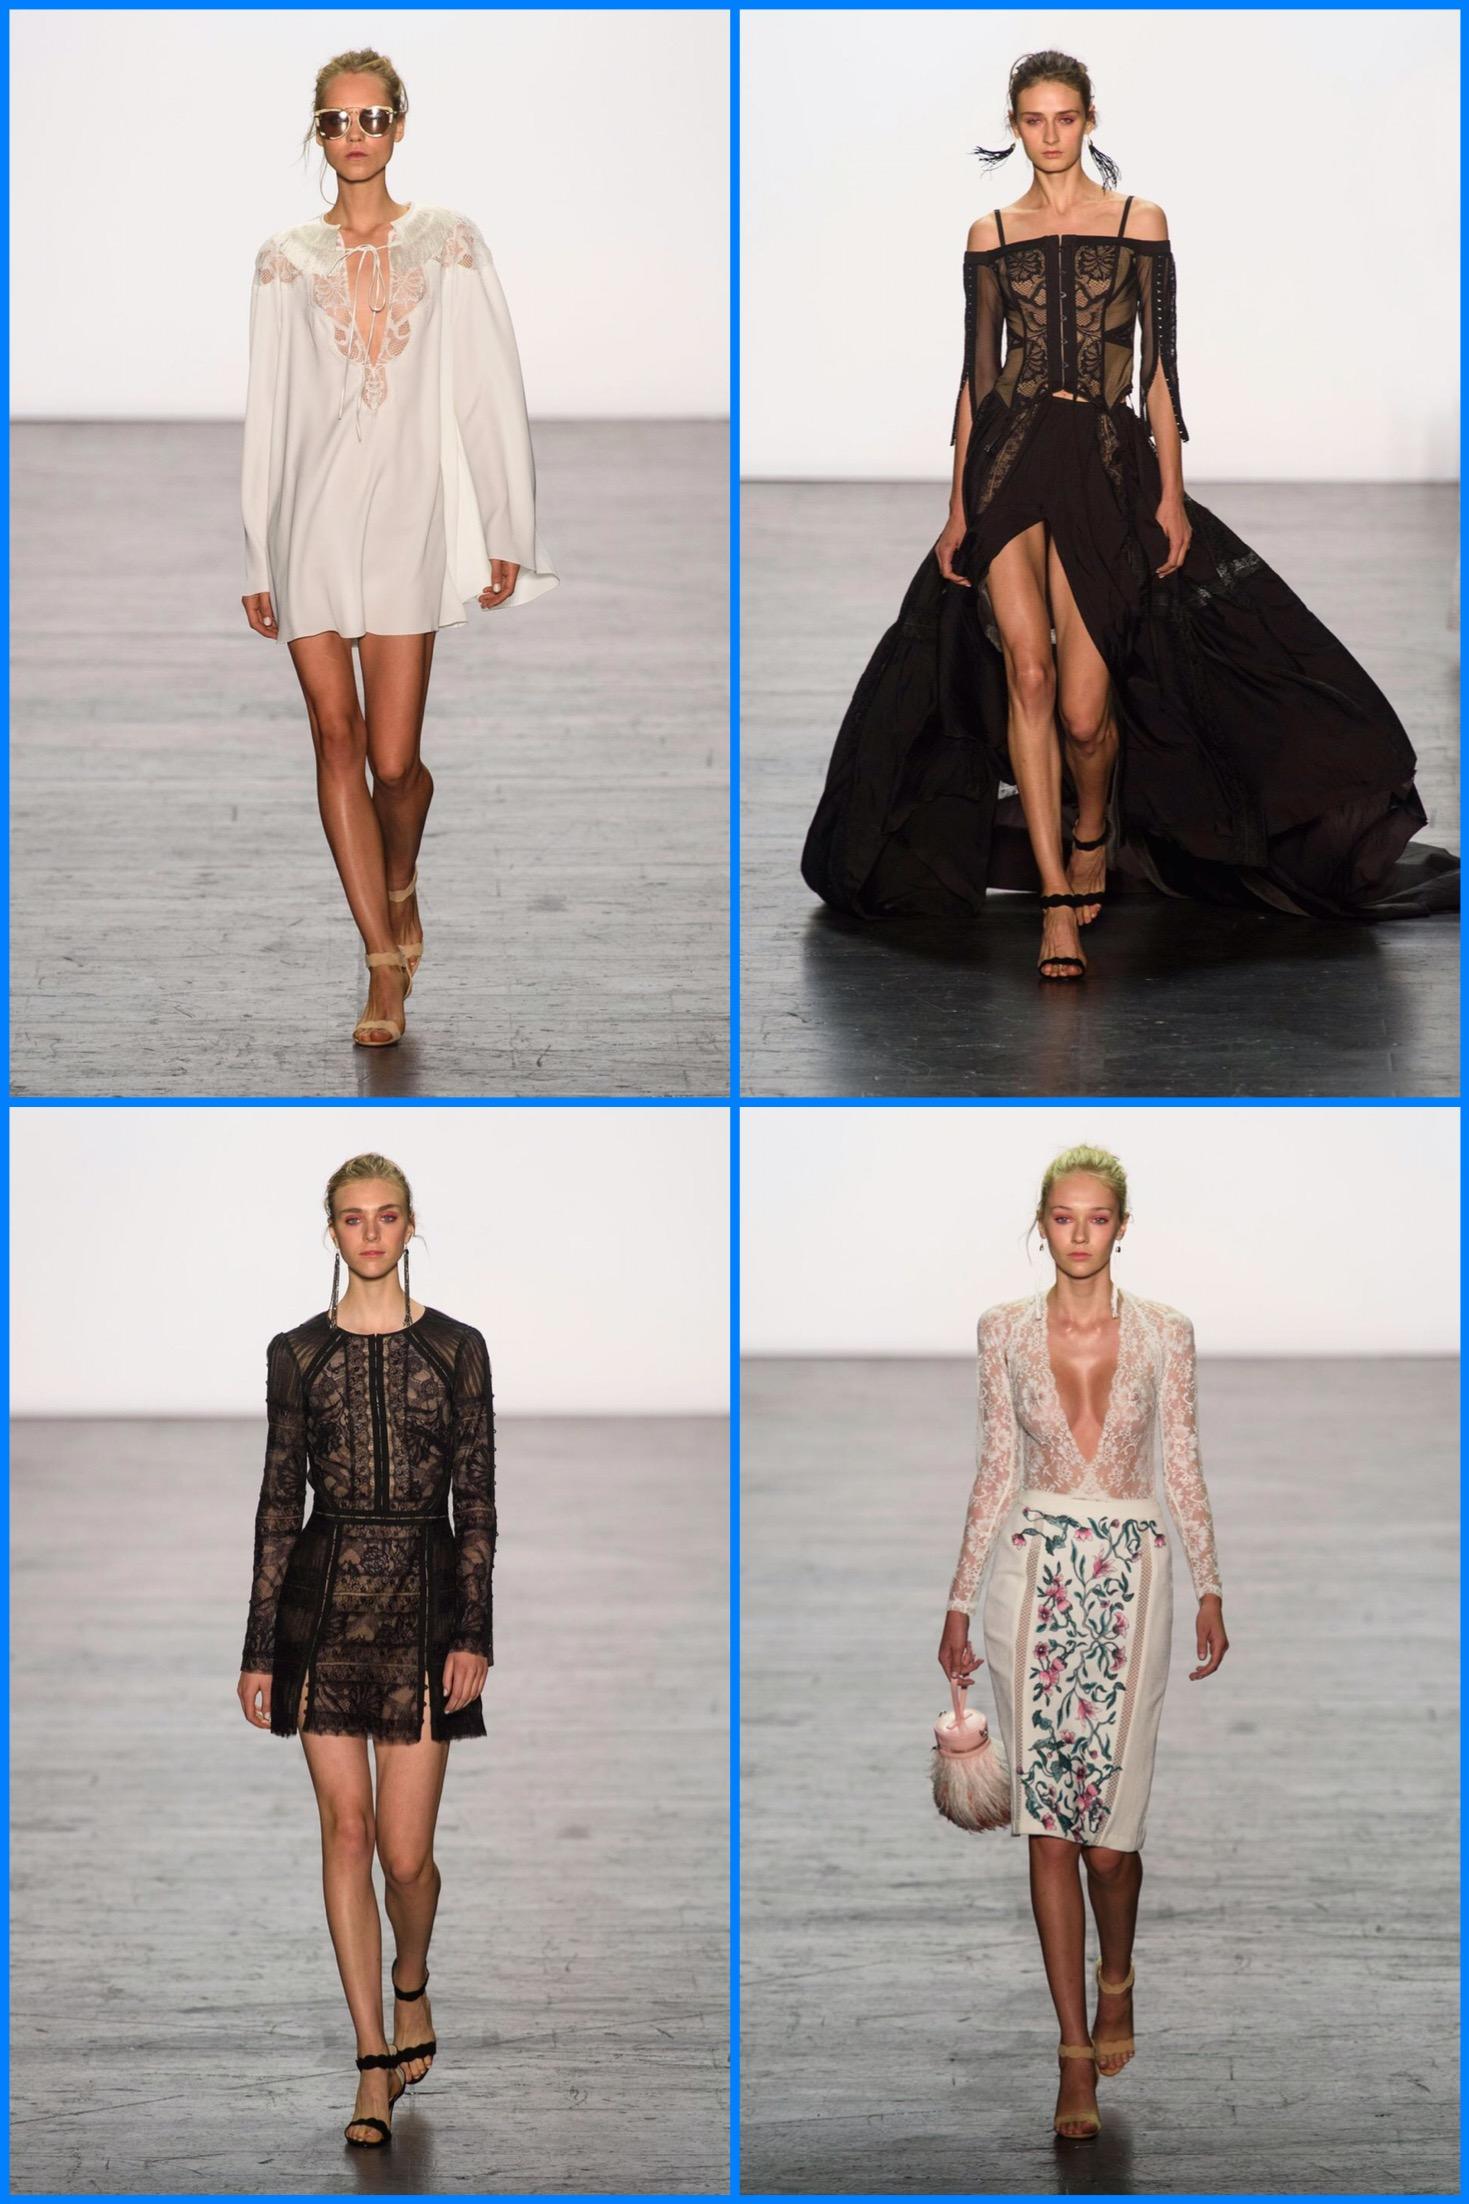 new-york-fashion-week-pret-a-porter-spring-summer-2017-style-tadashi-shoji